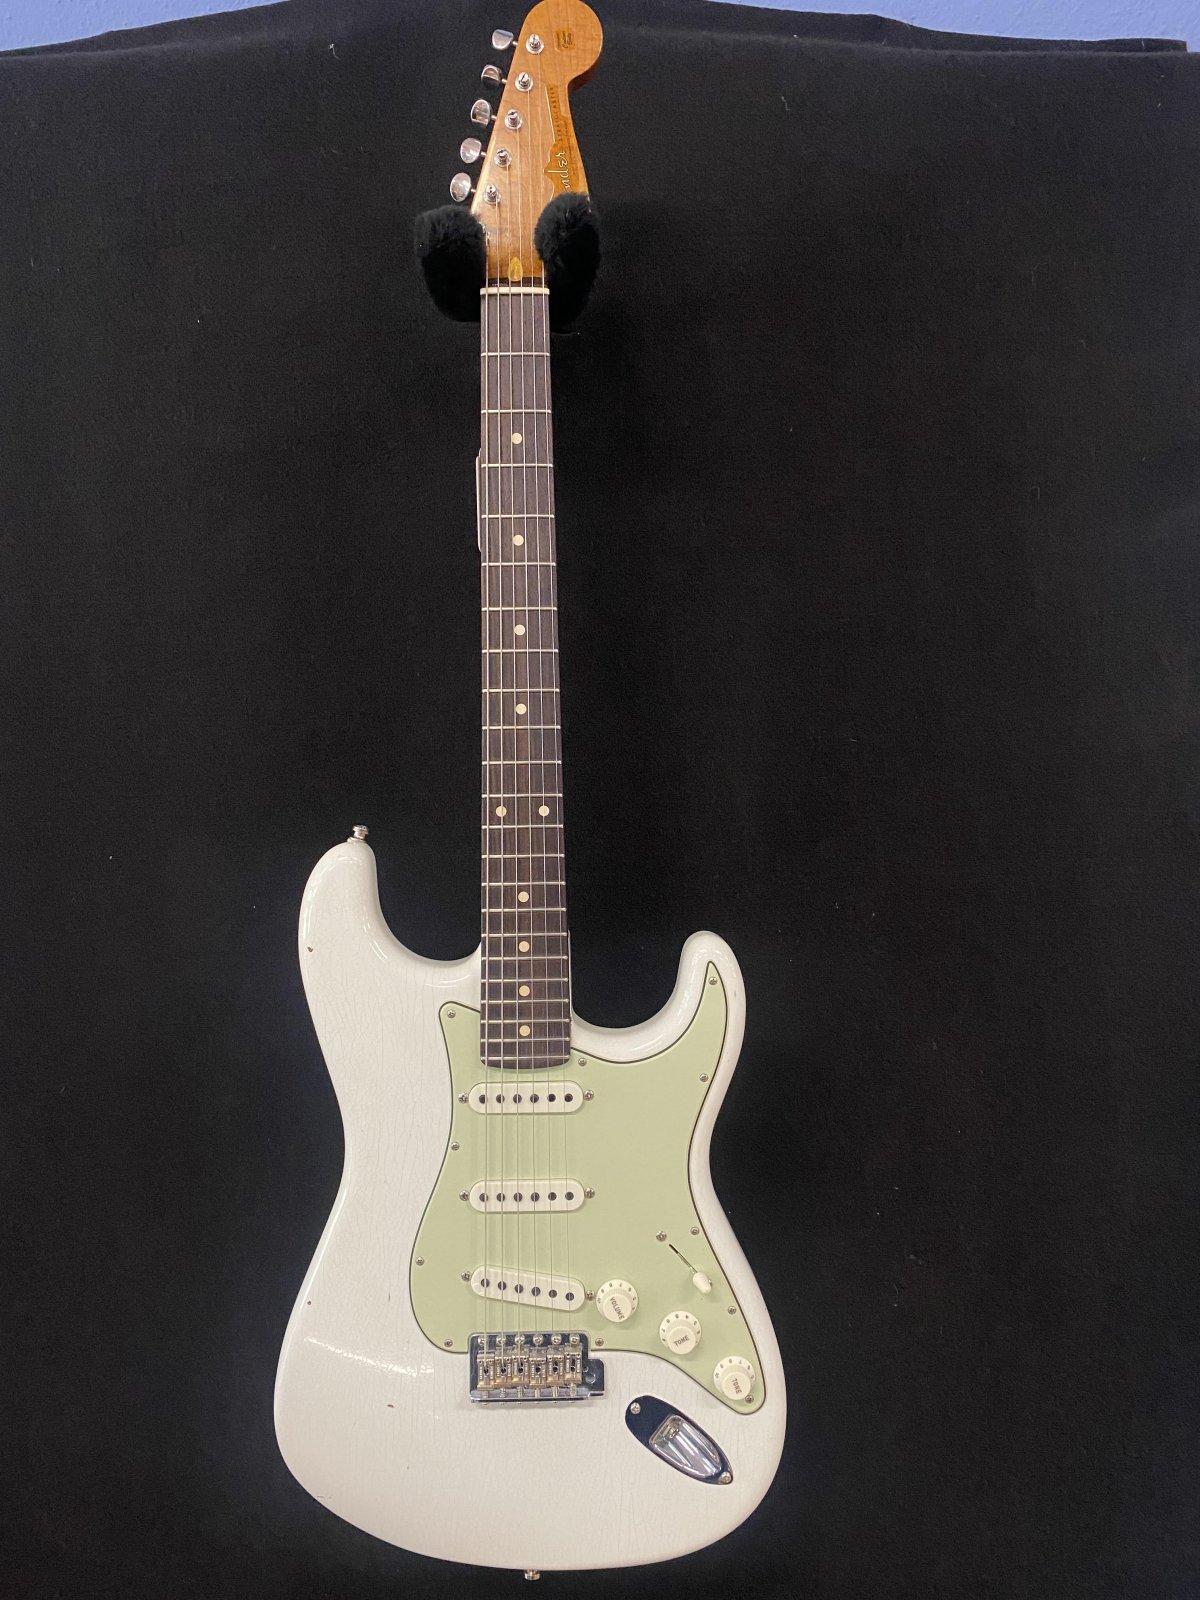 Used Fender stratocaster custom shop GT11